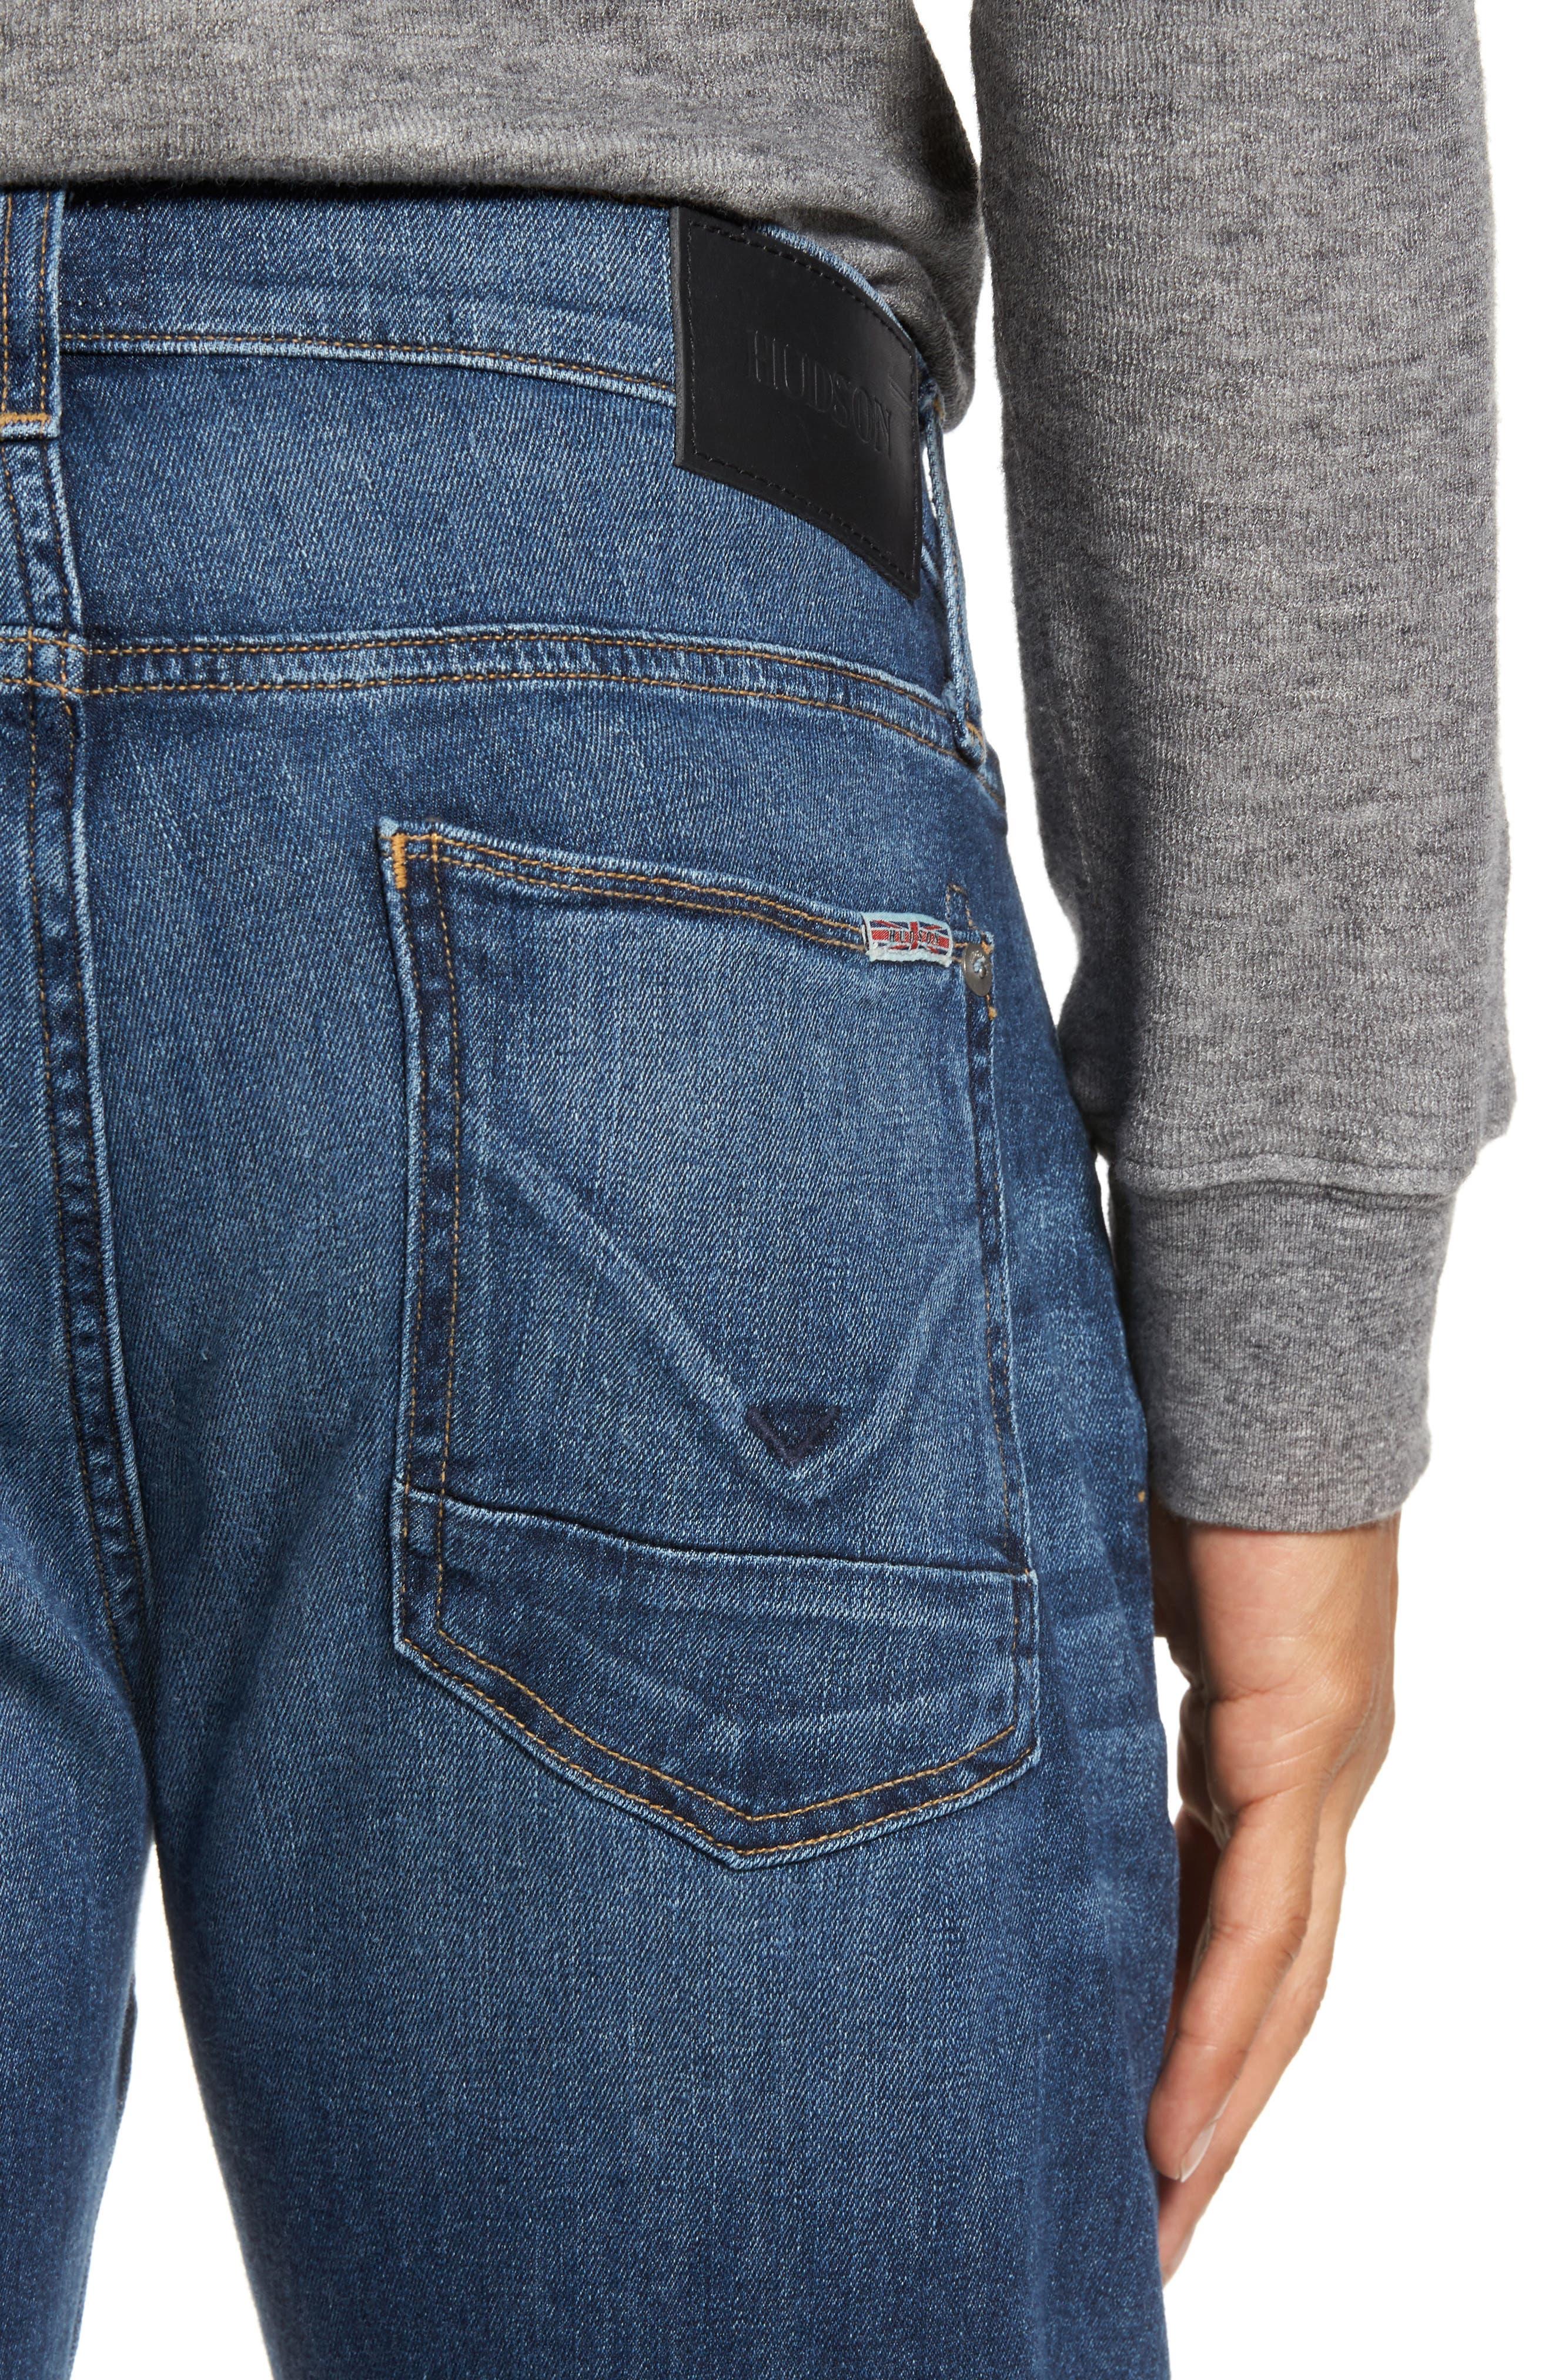 Blake Slim Fit Jeans,                             Alternate thumbnail 4, color,                             Calloway